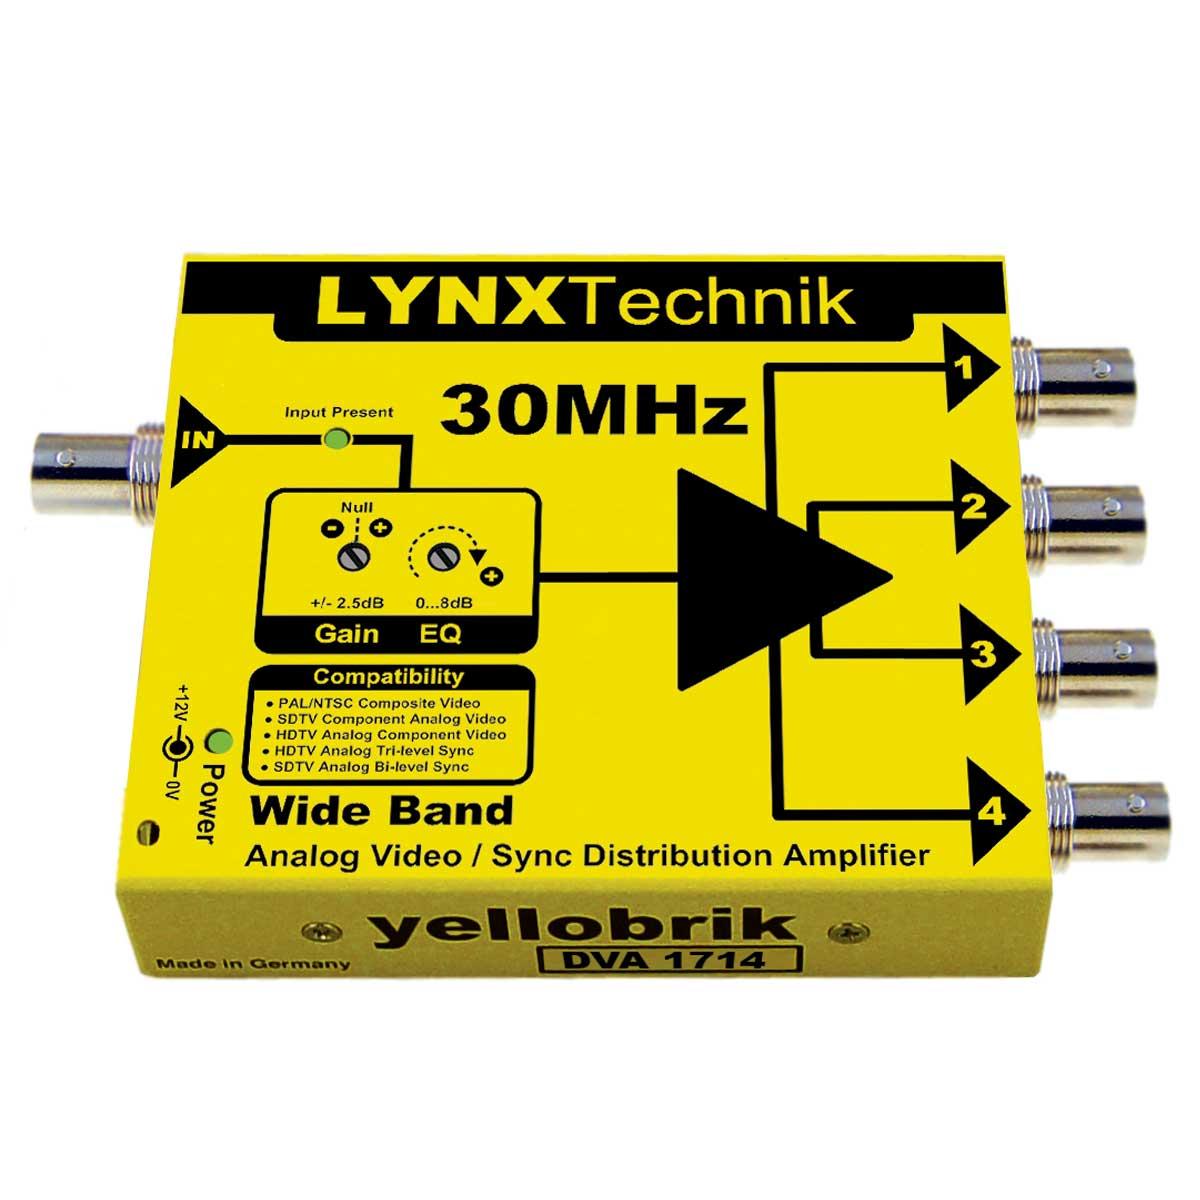 DVA 1714 yellobrik 1 > 4 Analog Video Distribution Amplifier